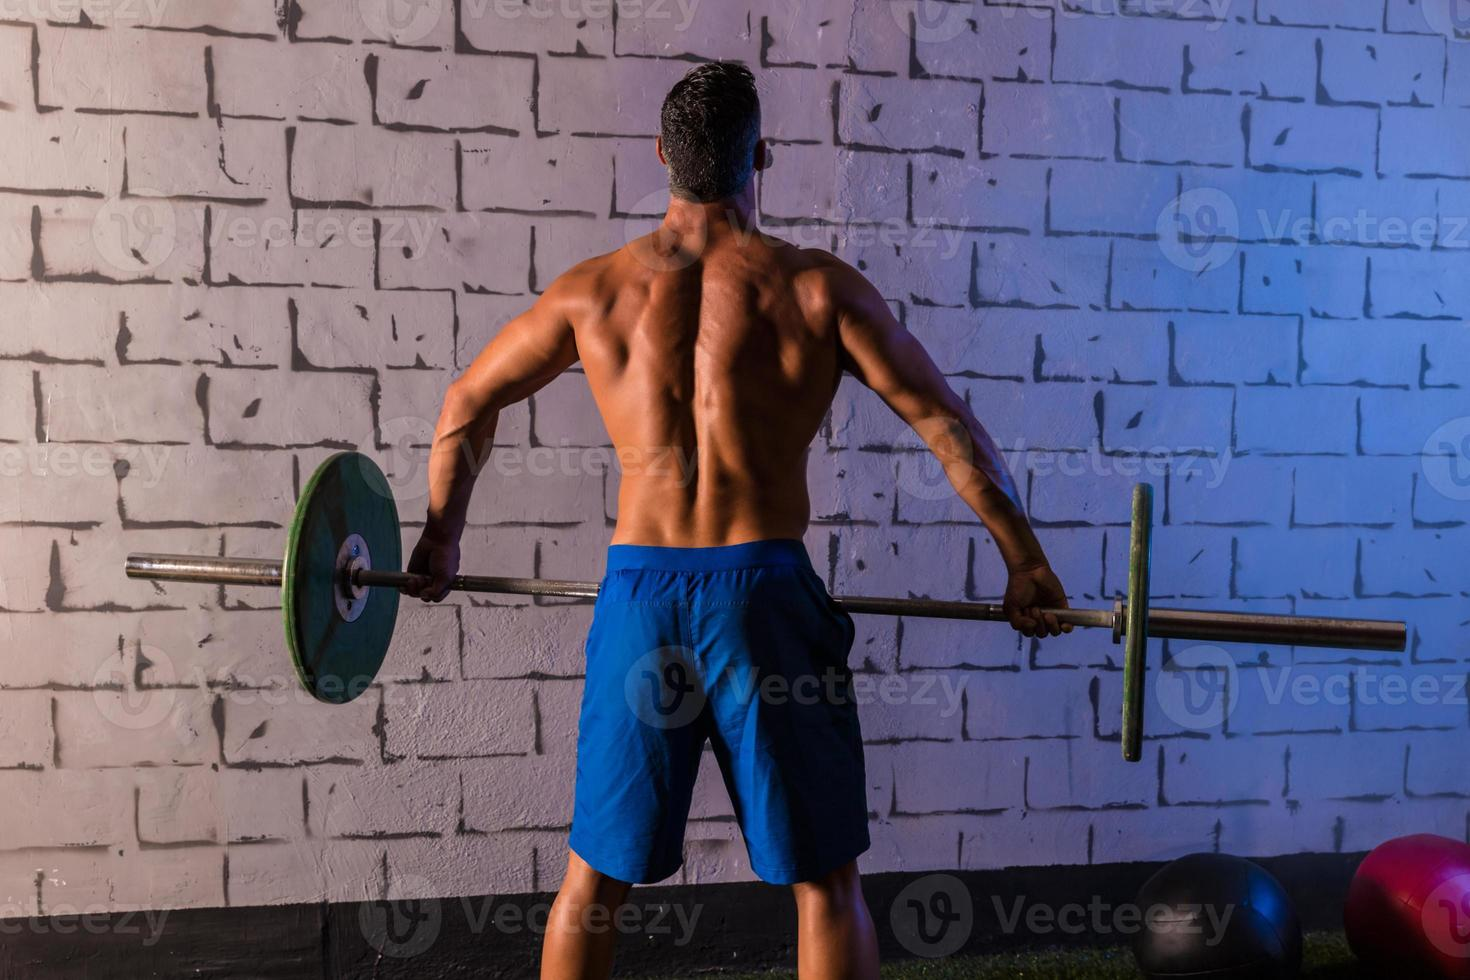 sollevamento pesi bilanciere uomo retrovisione allenamento palestra foto